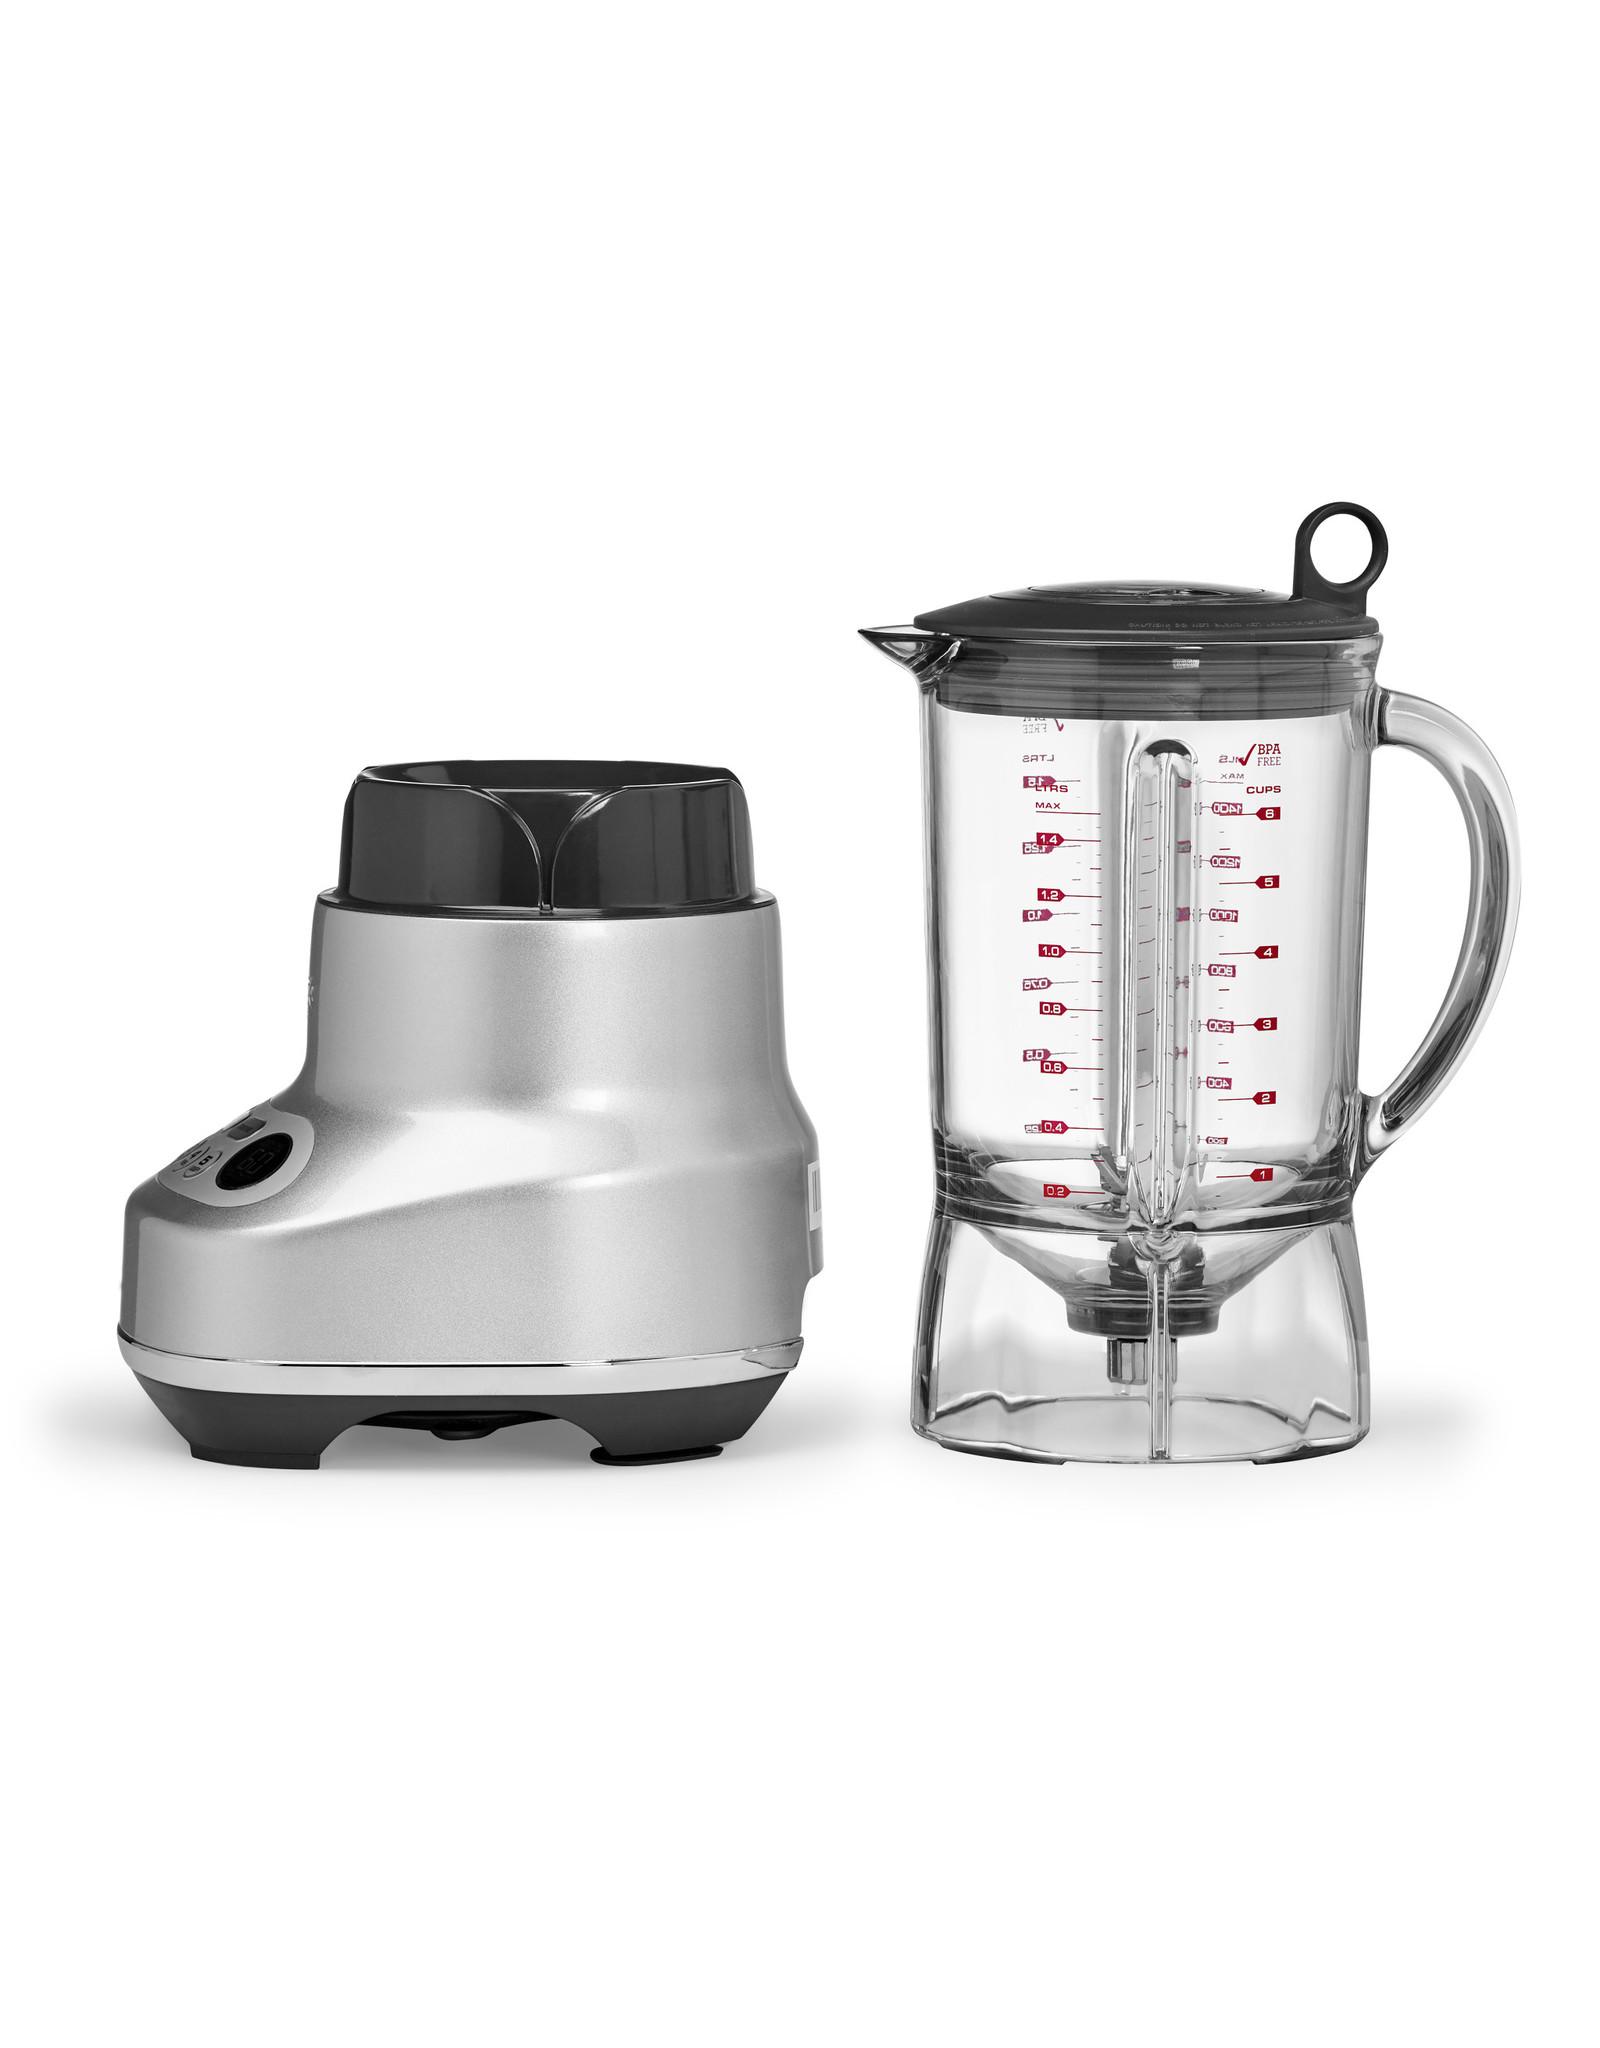 Sage Appliances Blender the Fresh & Furious™